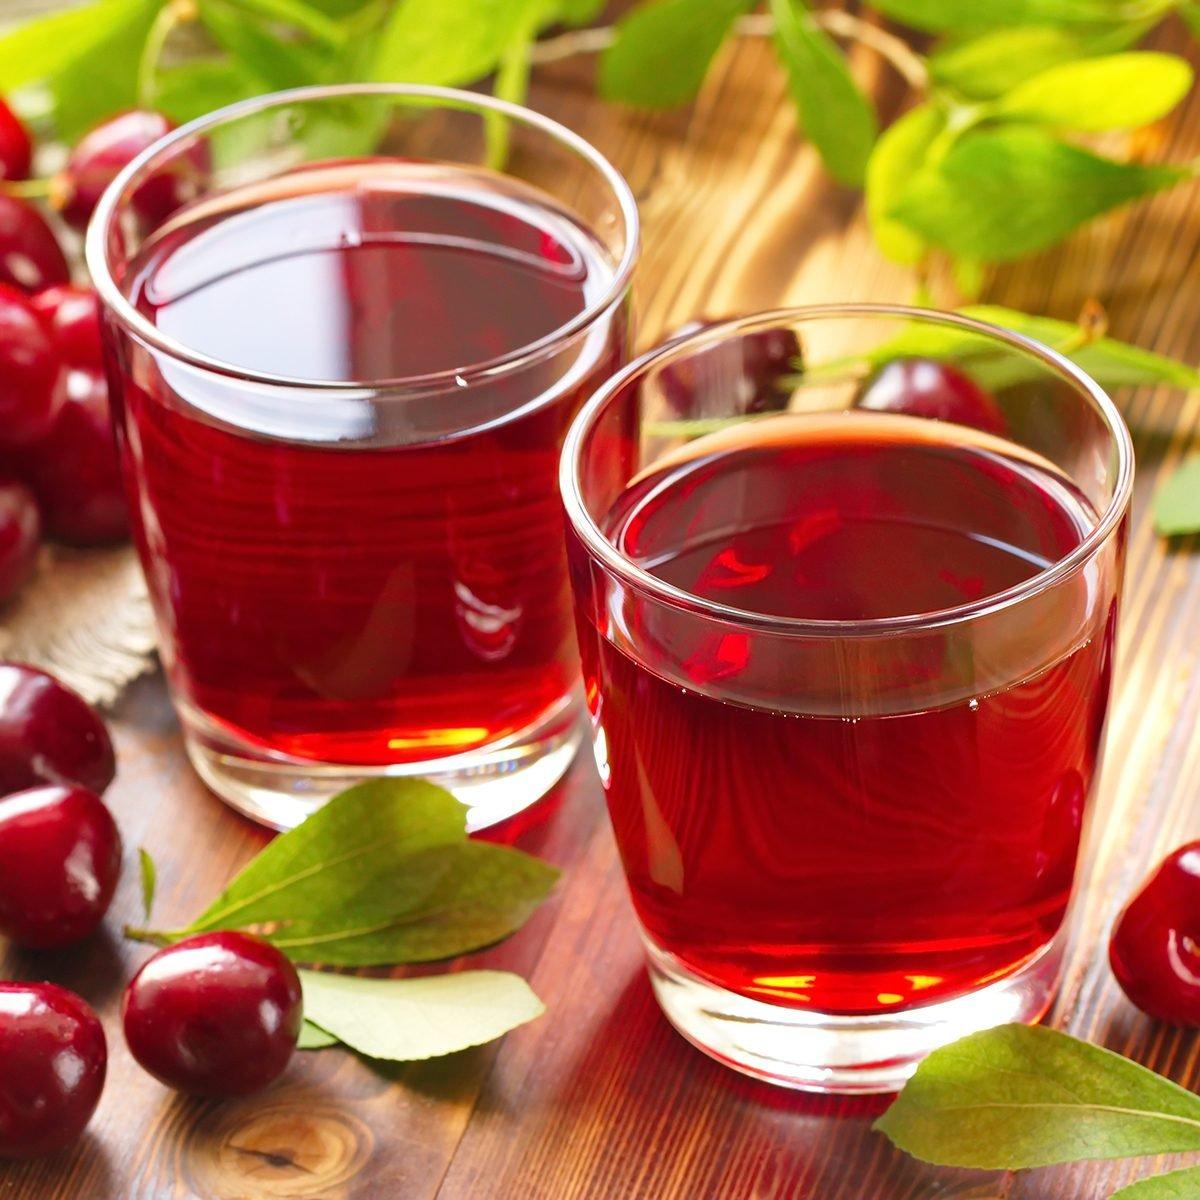 9 Tart Cherry Juice Benefits Taste Of Home